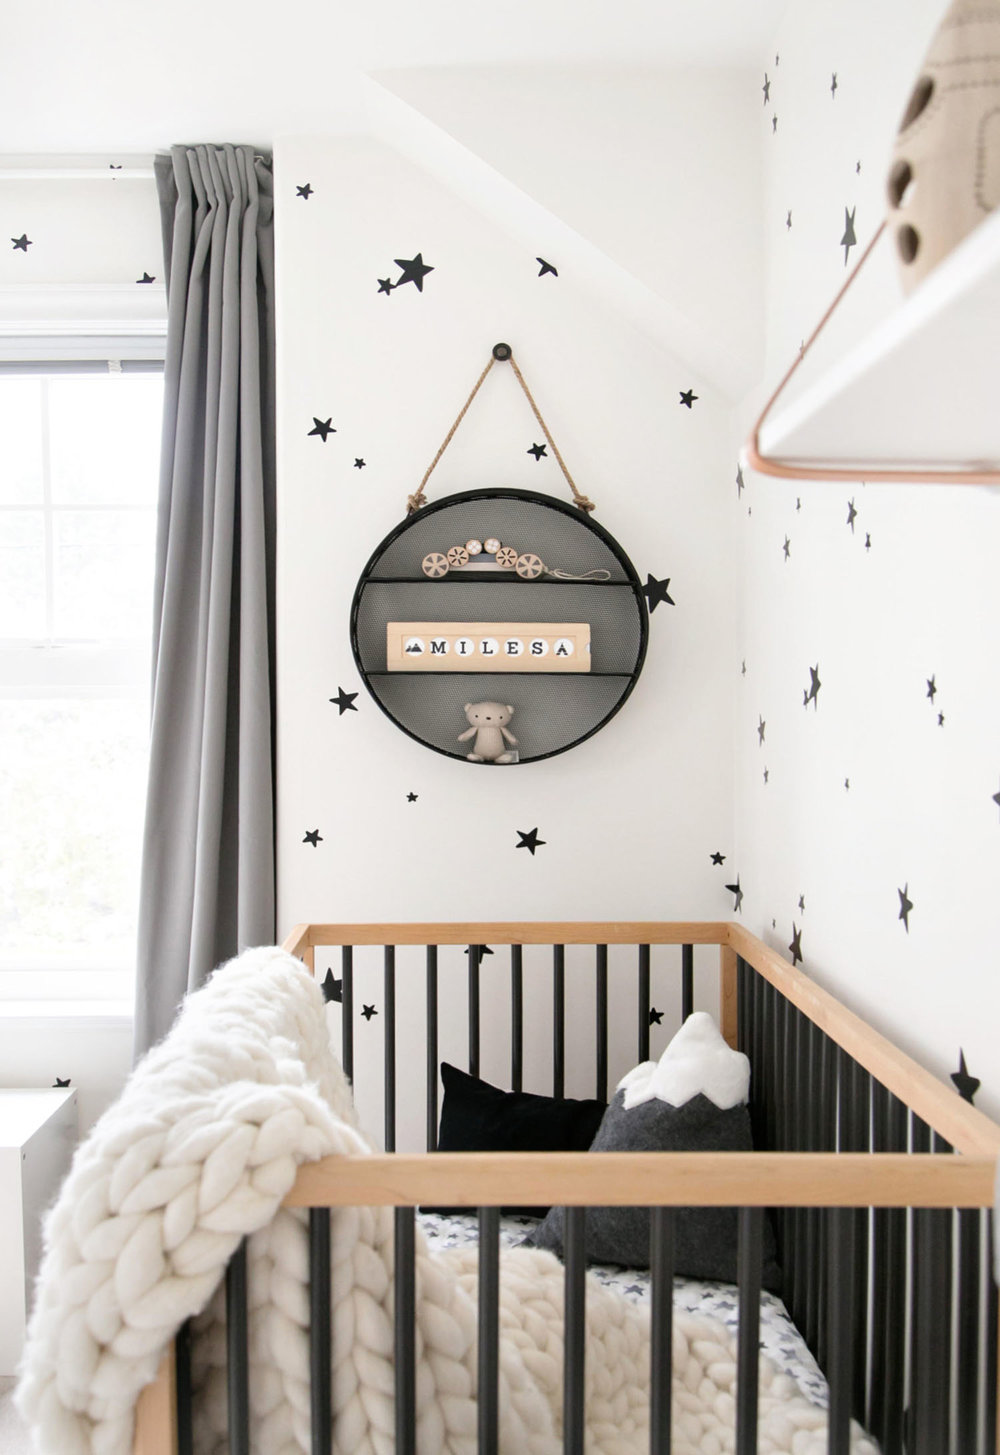 Miles-crib wall.jpg